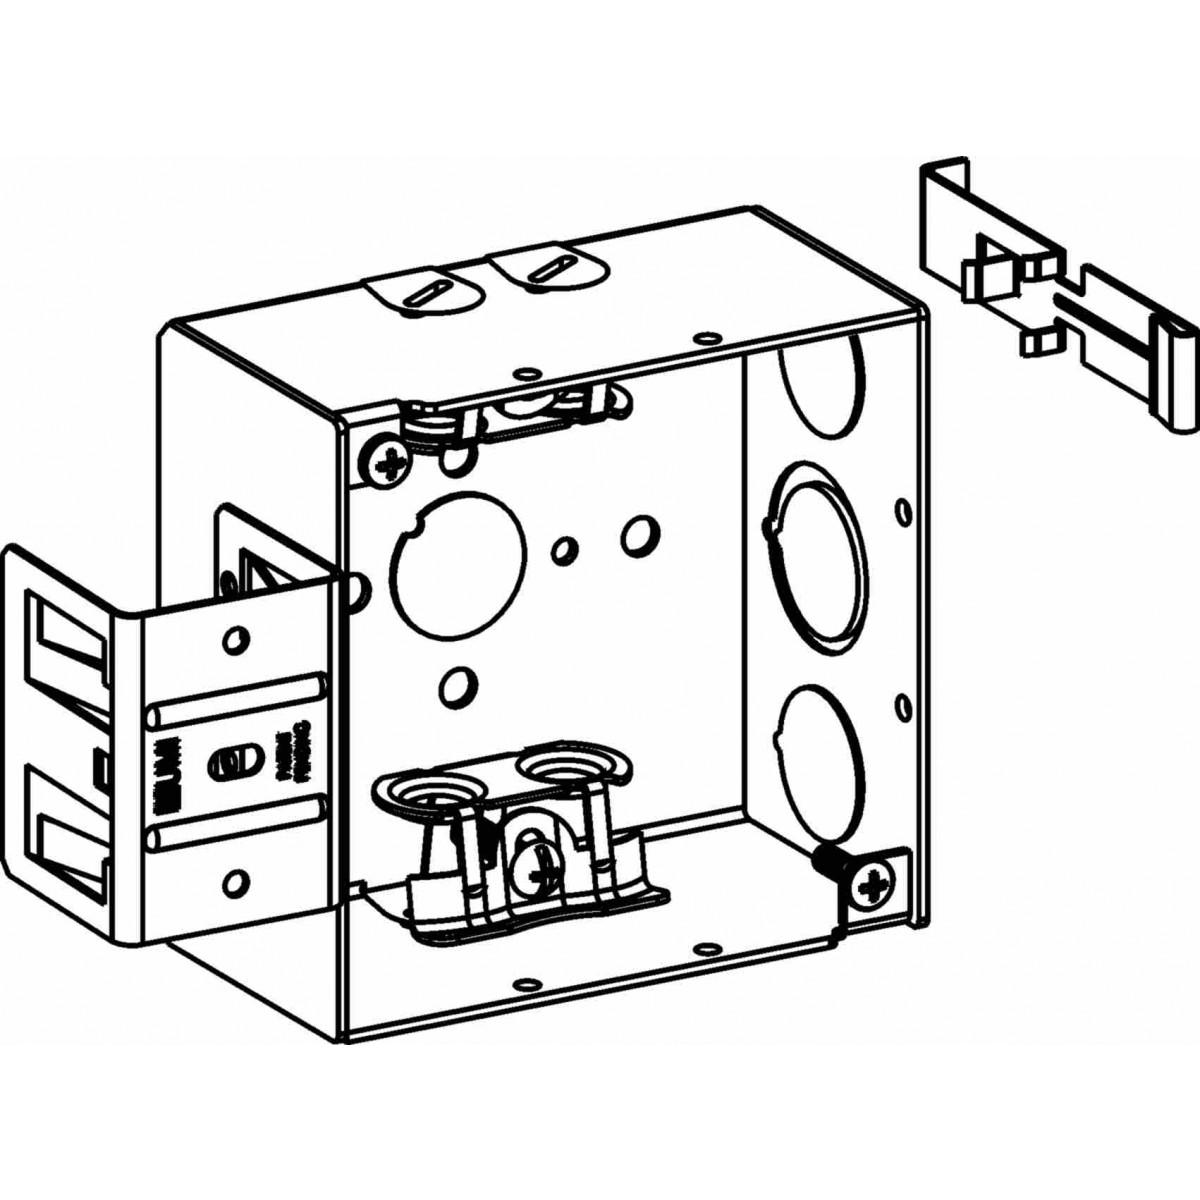 4sdb-mc-ms - 4 u201d  4s  boxes